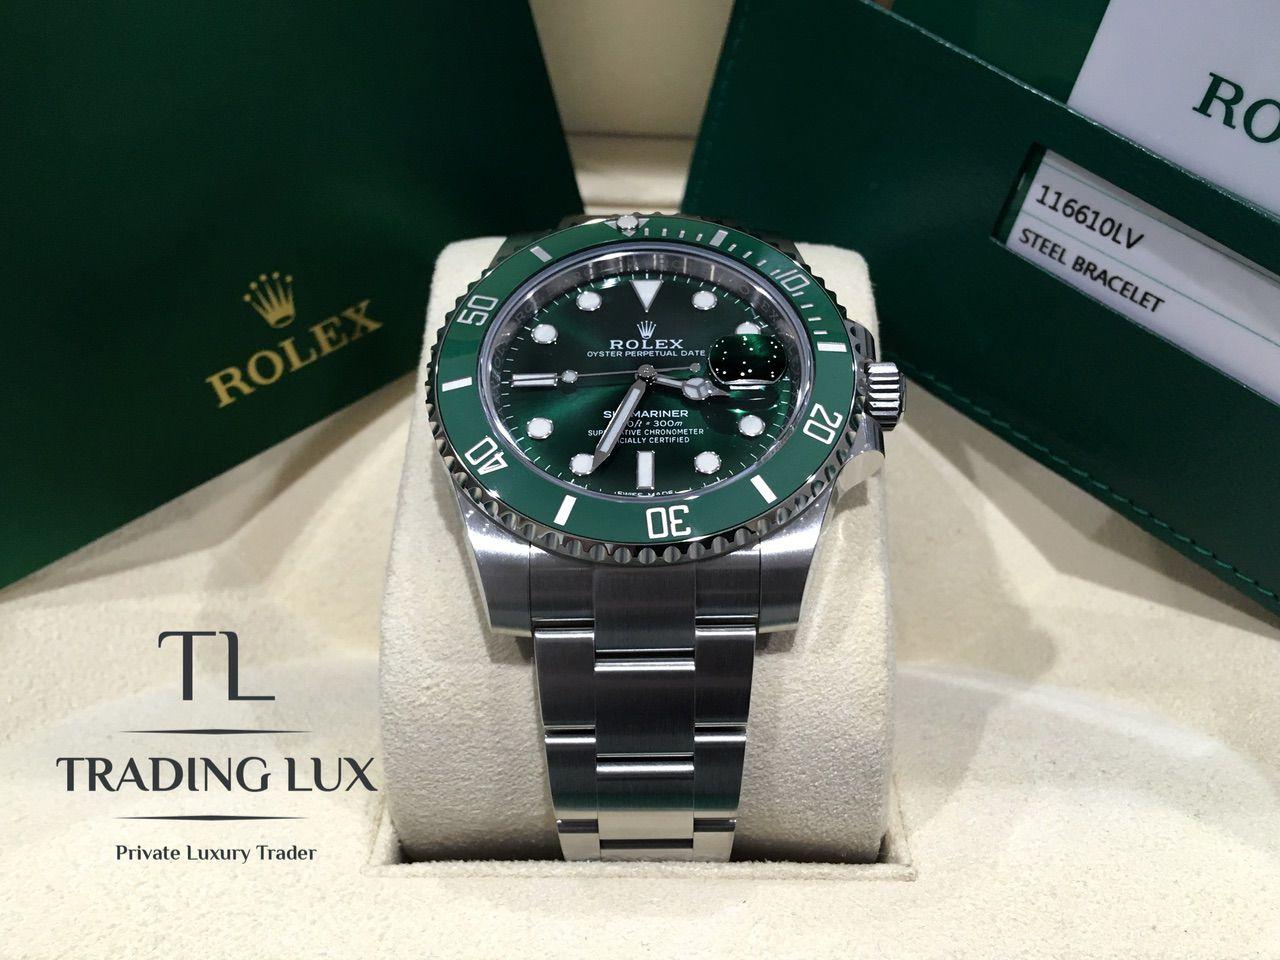 Rolex-116610LV-Hulk-12